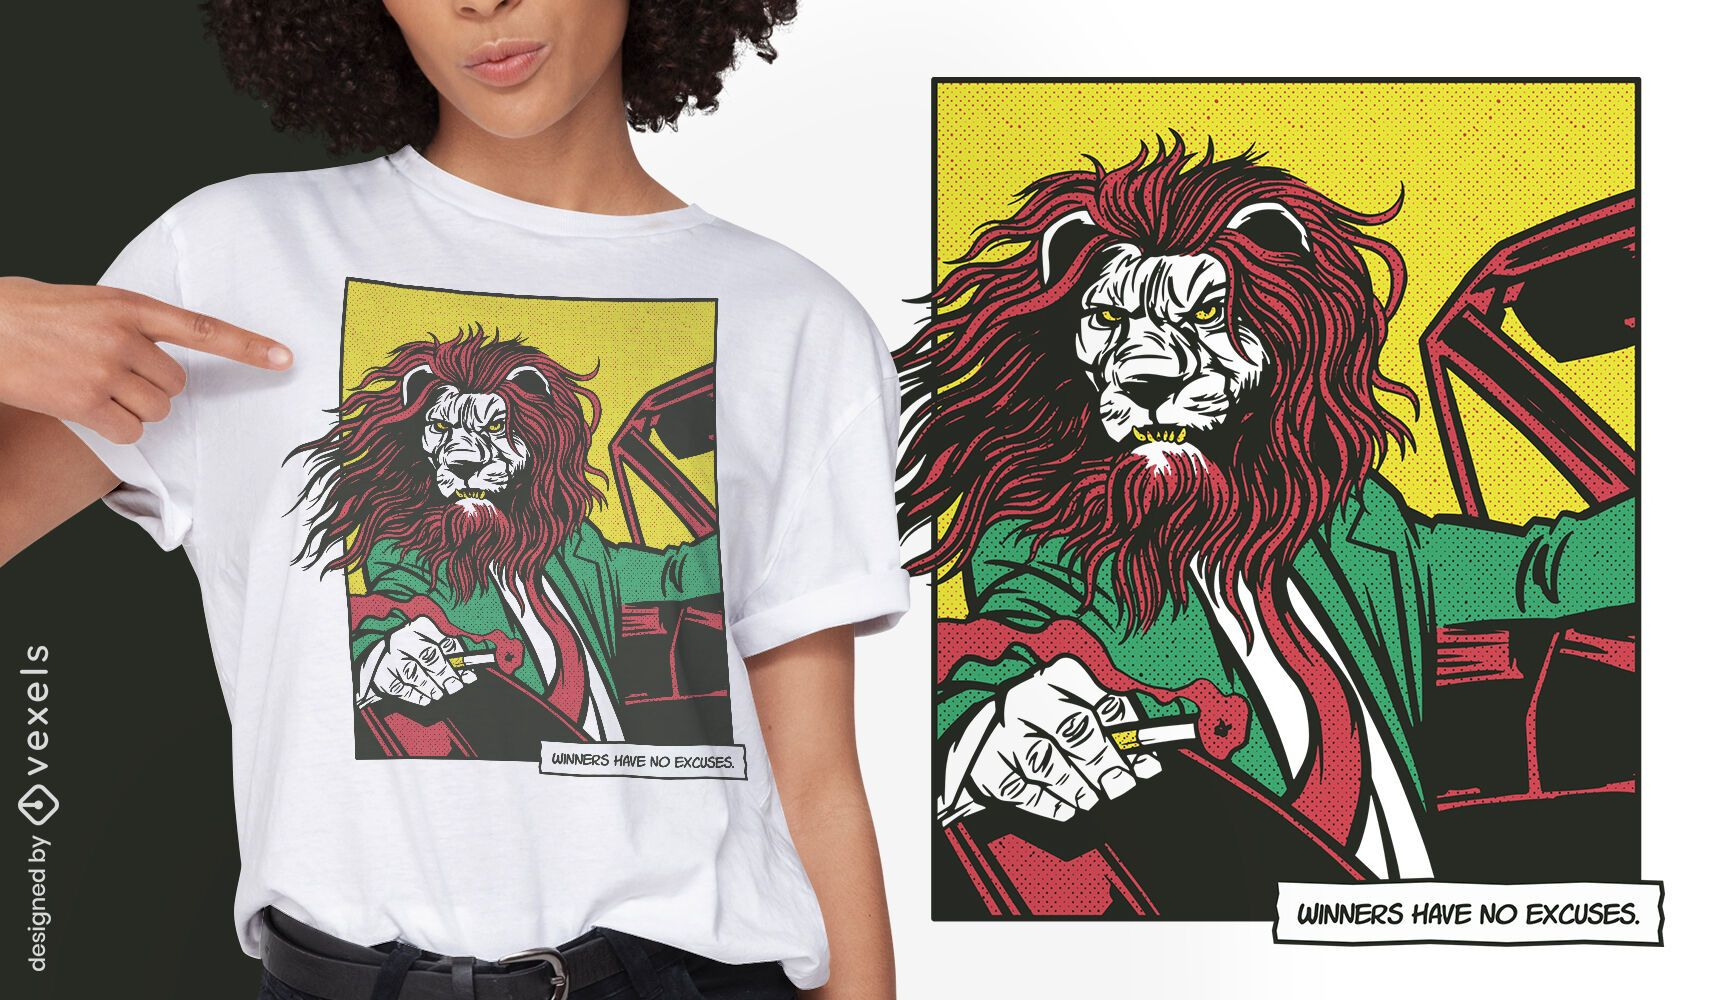 Lion driving animal comic t-shirt design